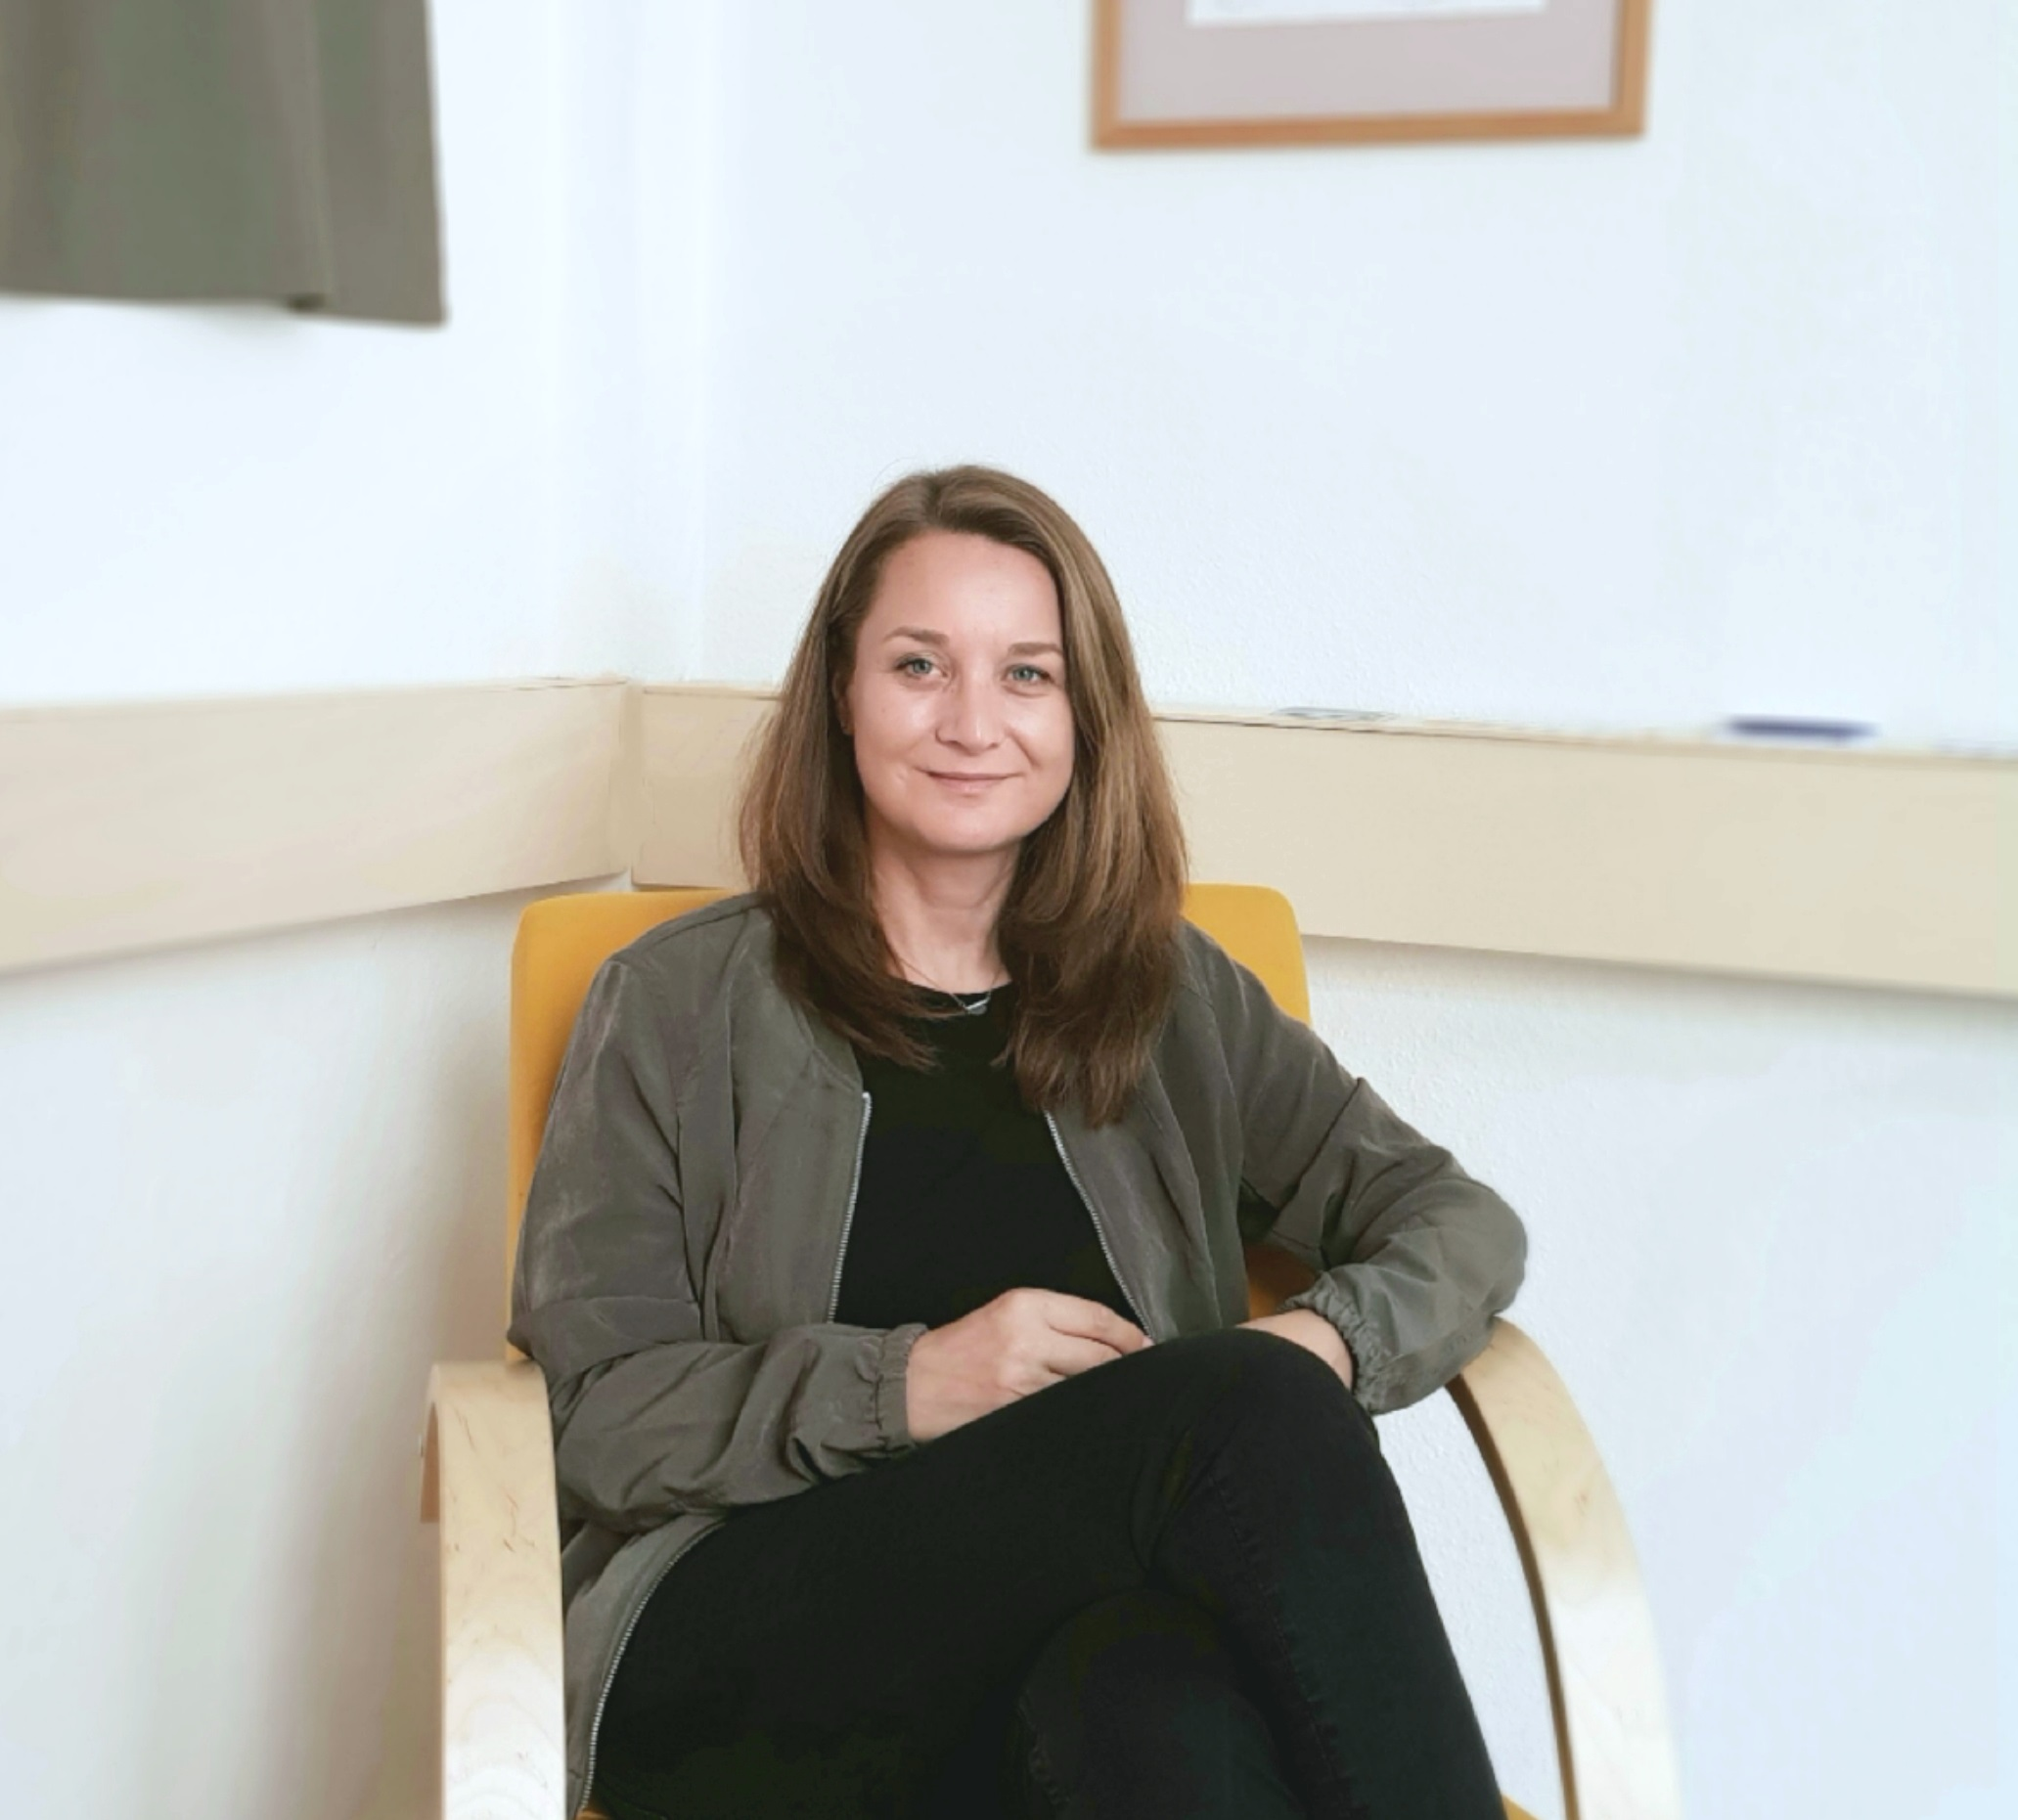 Tina Steckling - Soulmates psychologischer Support in Berlin Neukölln